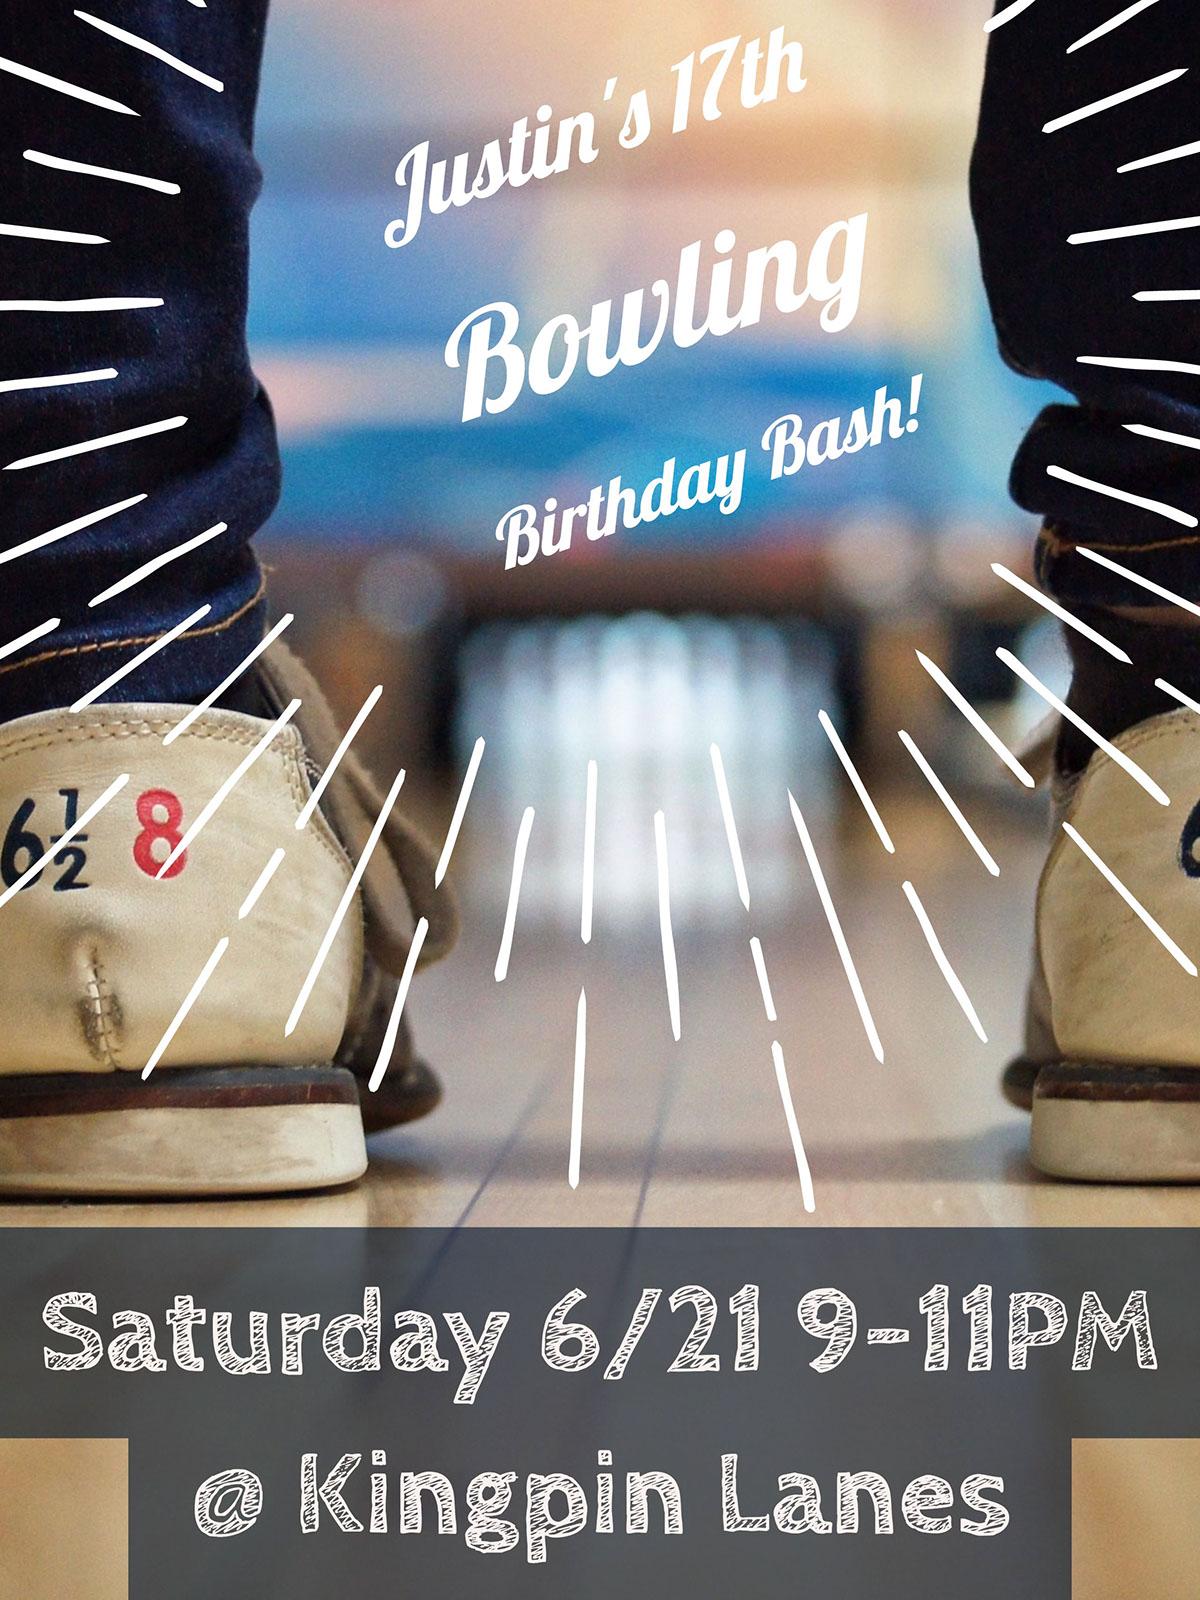 Justin's 17th Bowling Birthday Bash! Justin's 17th Bowling Birthday Bash! Saturday 6/21 9-11PM        @ Kingpin Lanes